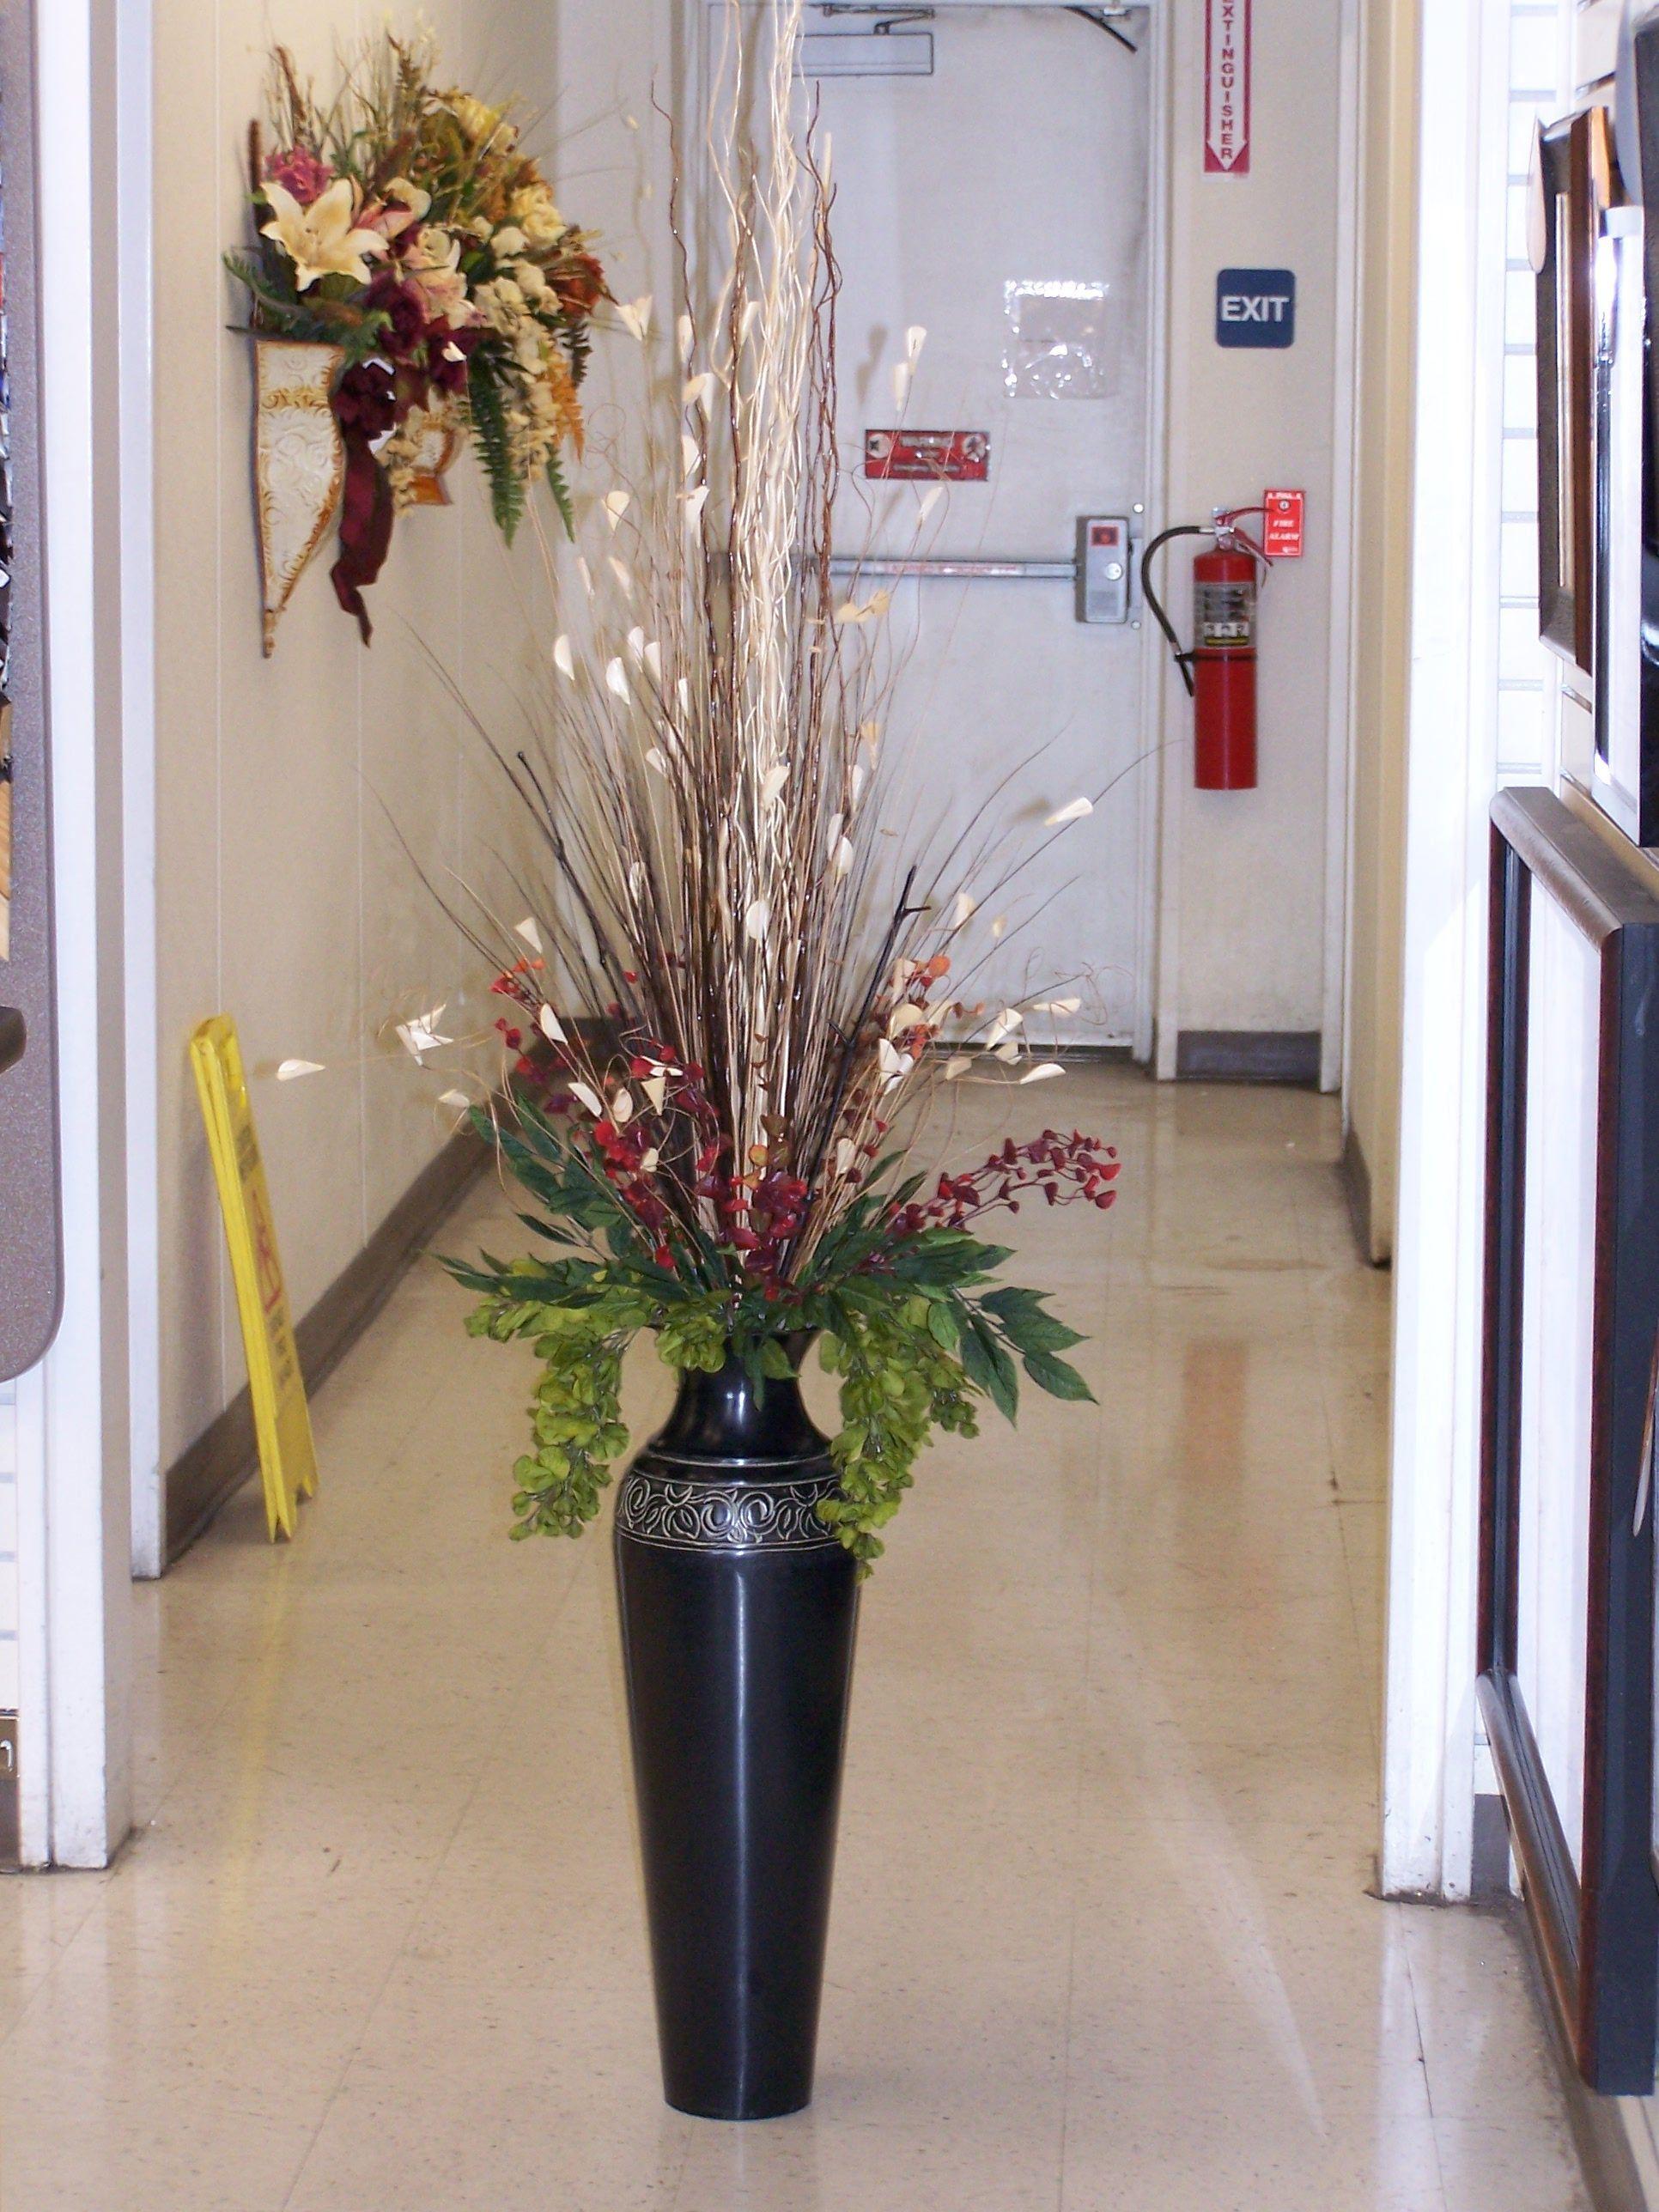 19 Awe Inspiring Ceramic Vases Head Ideas Flower Vase Arrangements Tall Vase Decor Vases Decor